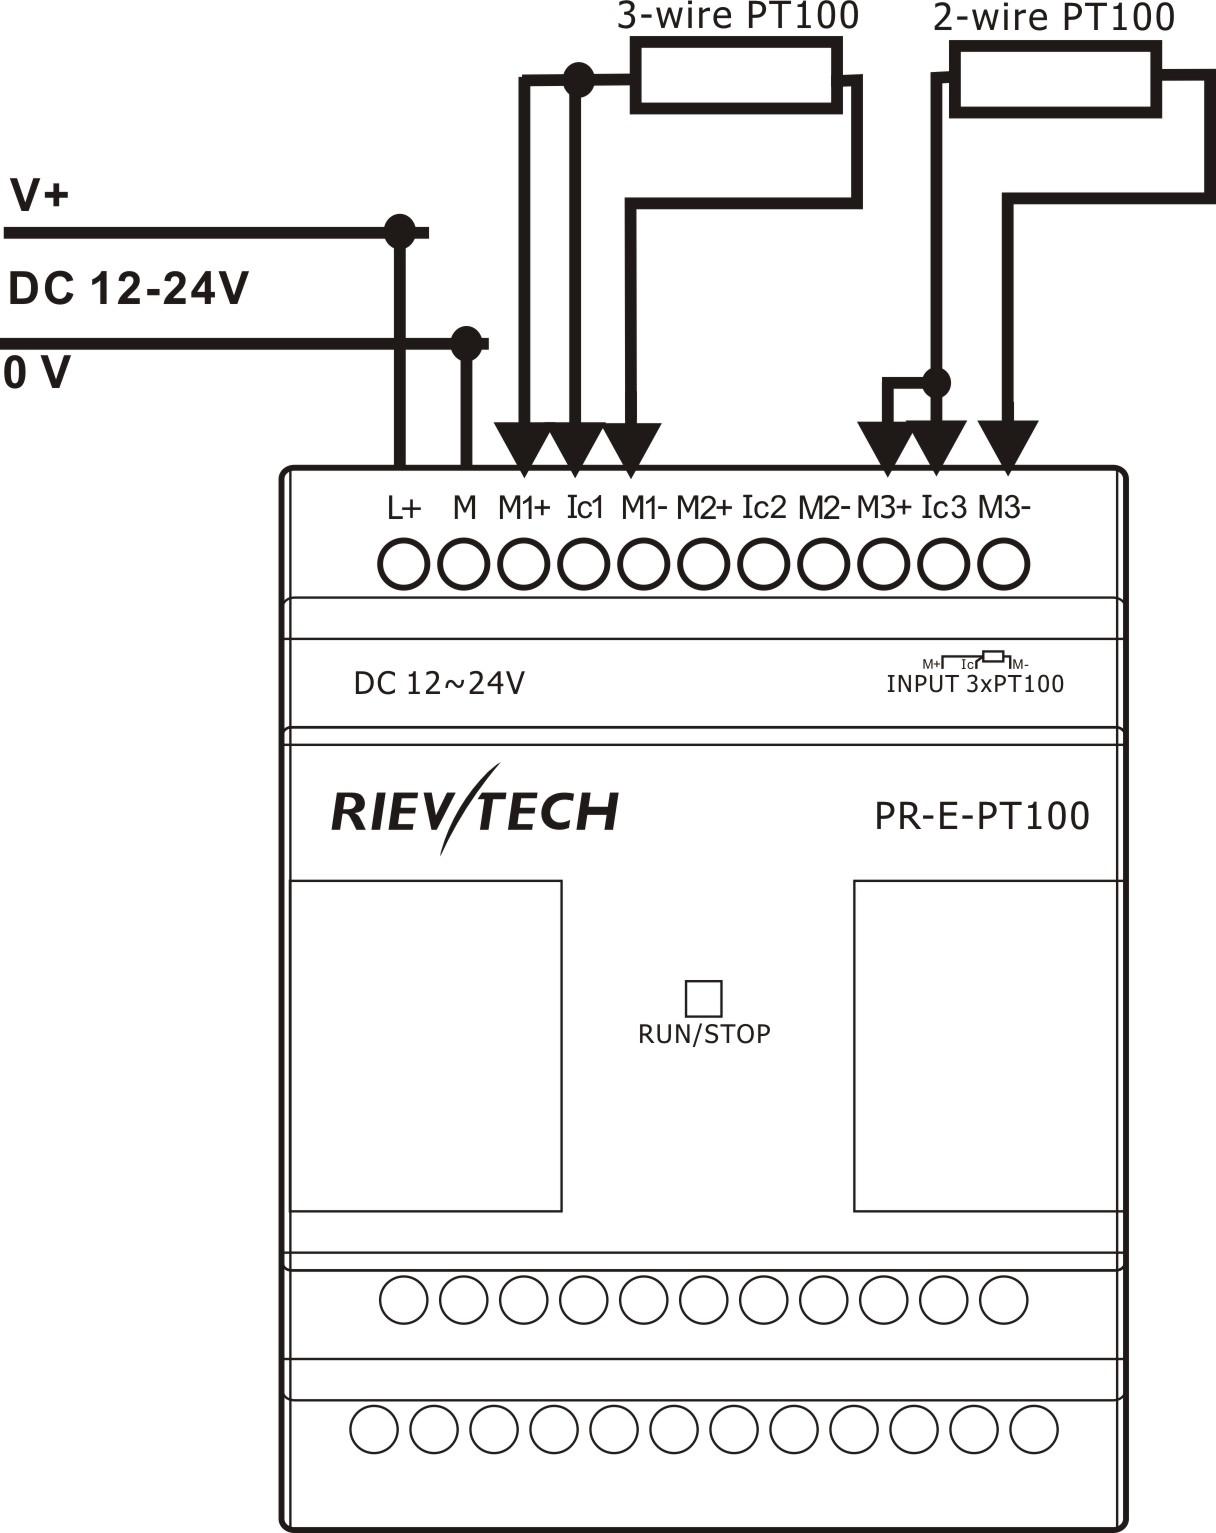 Plc Pt100 3 Wire Center Rtd Wiring Diagram Pr E Buy Ethernet Module Sms Product On Rievtech Rh Com Theory Sensor